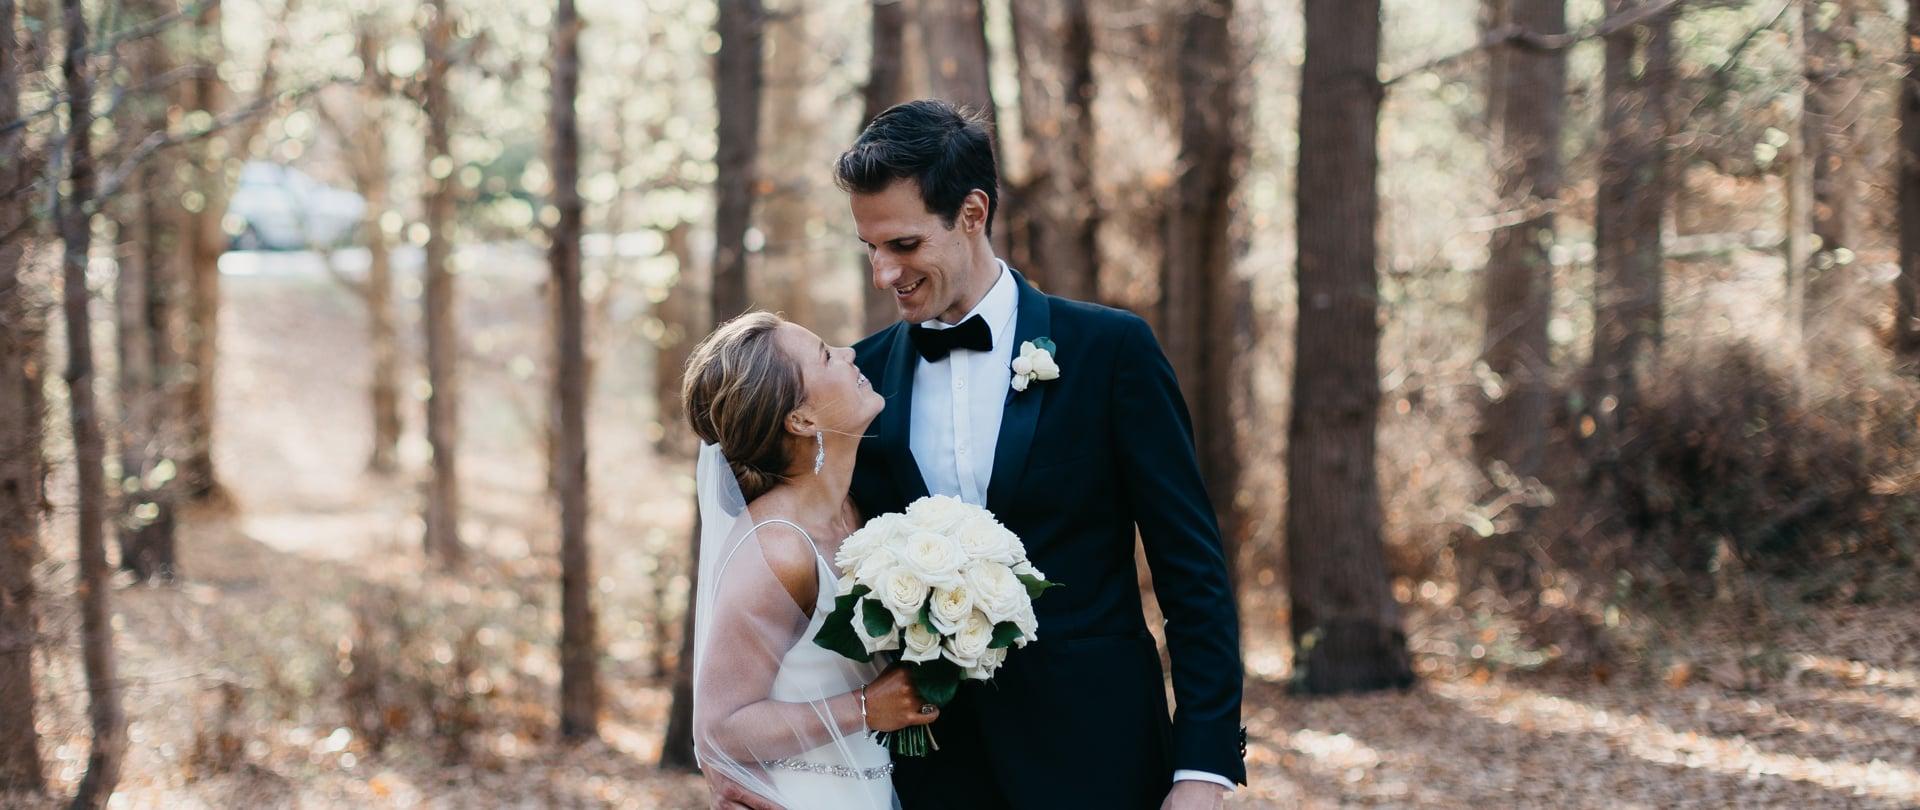 Sarah & Oli Wedding Video Filmed at Mornington Peninsula, Victoria